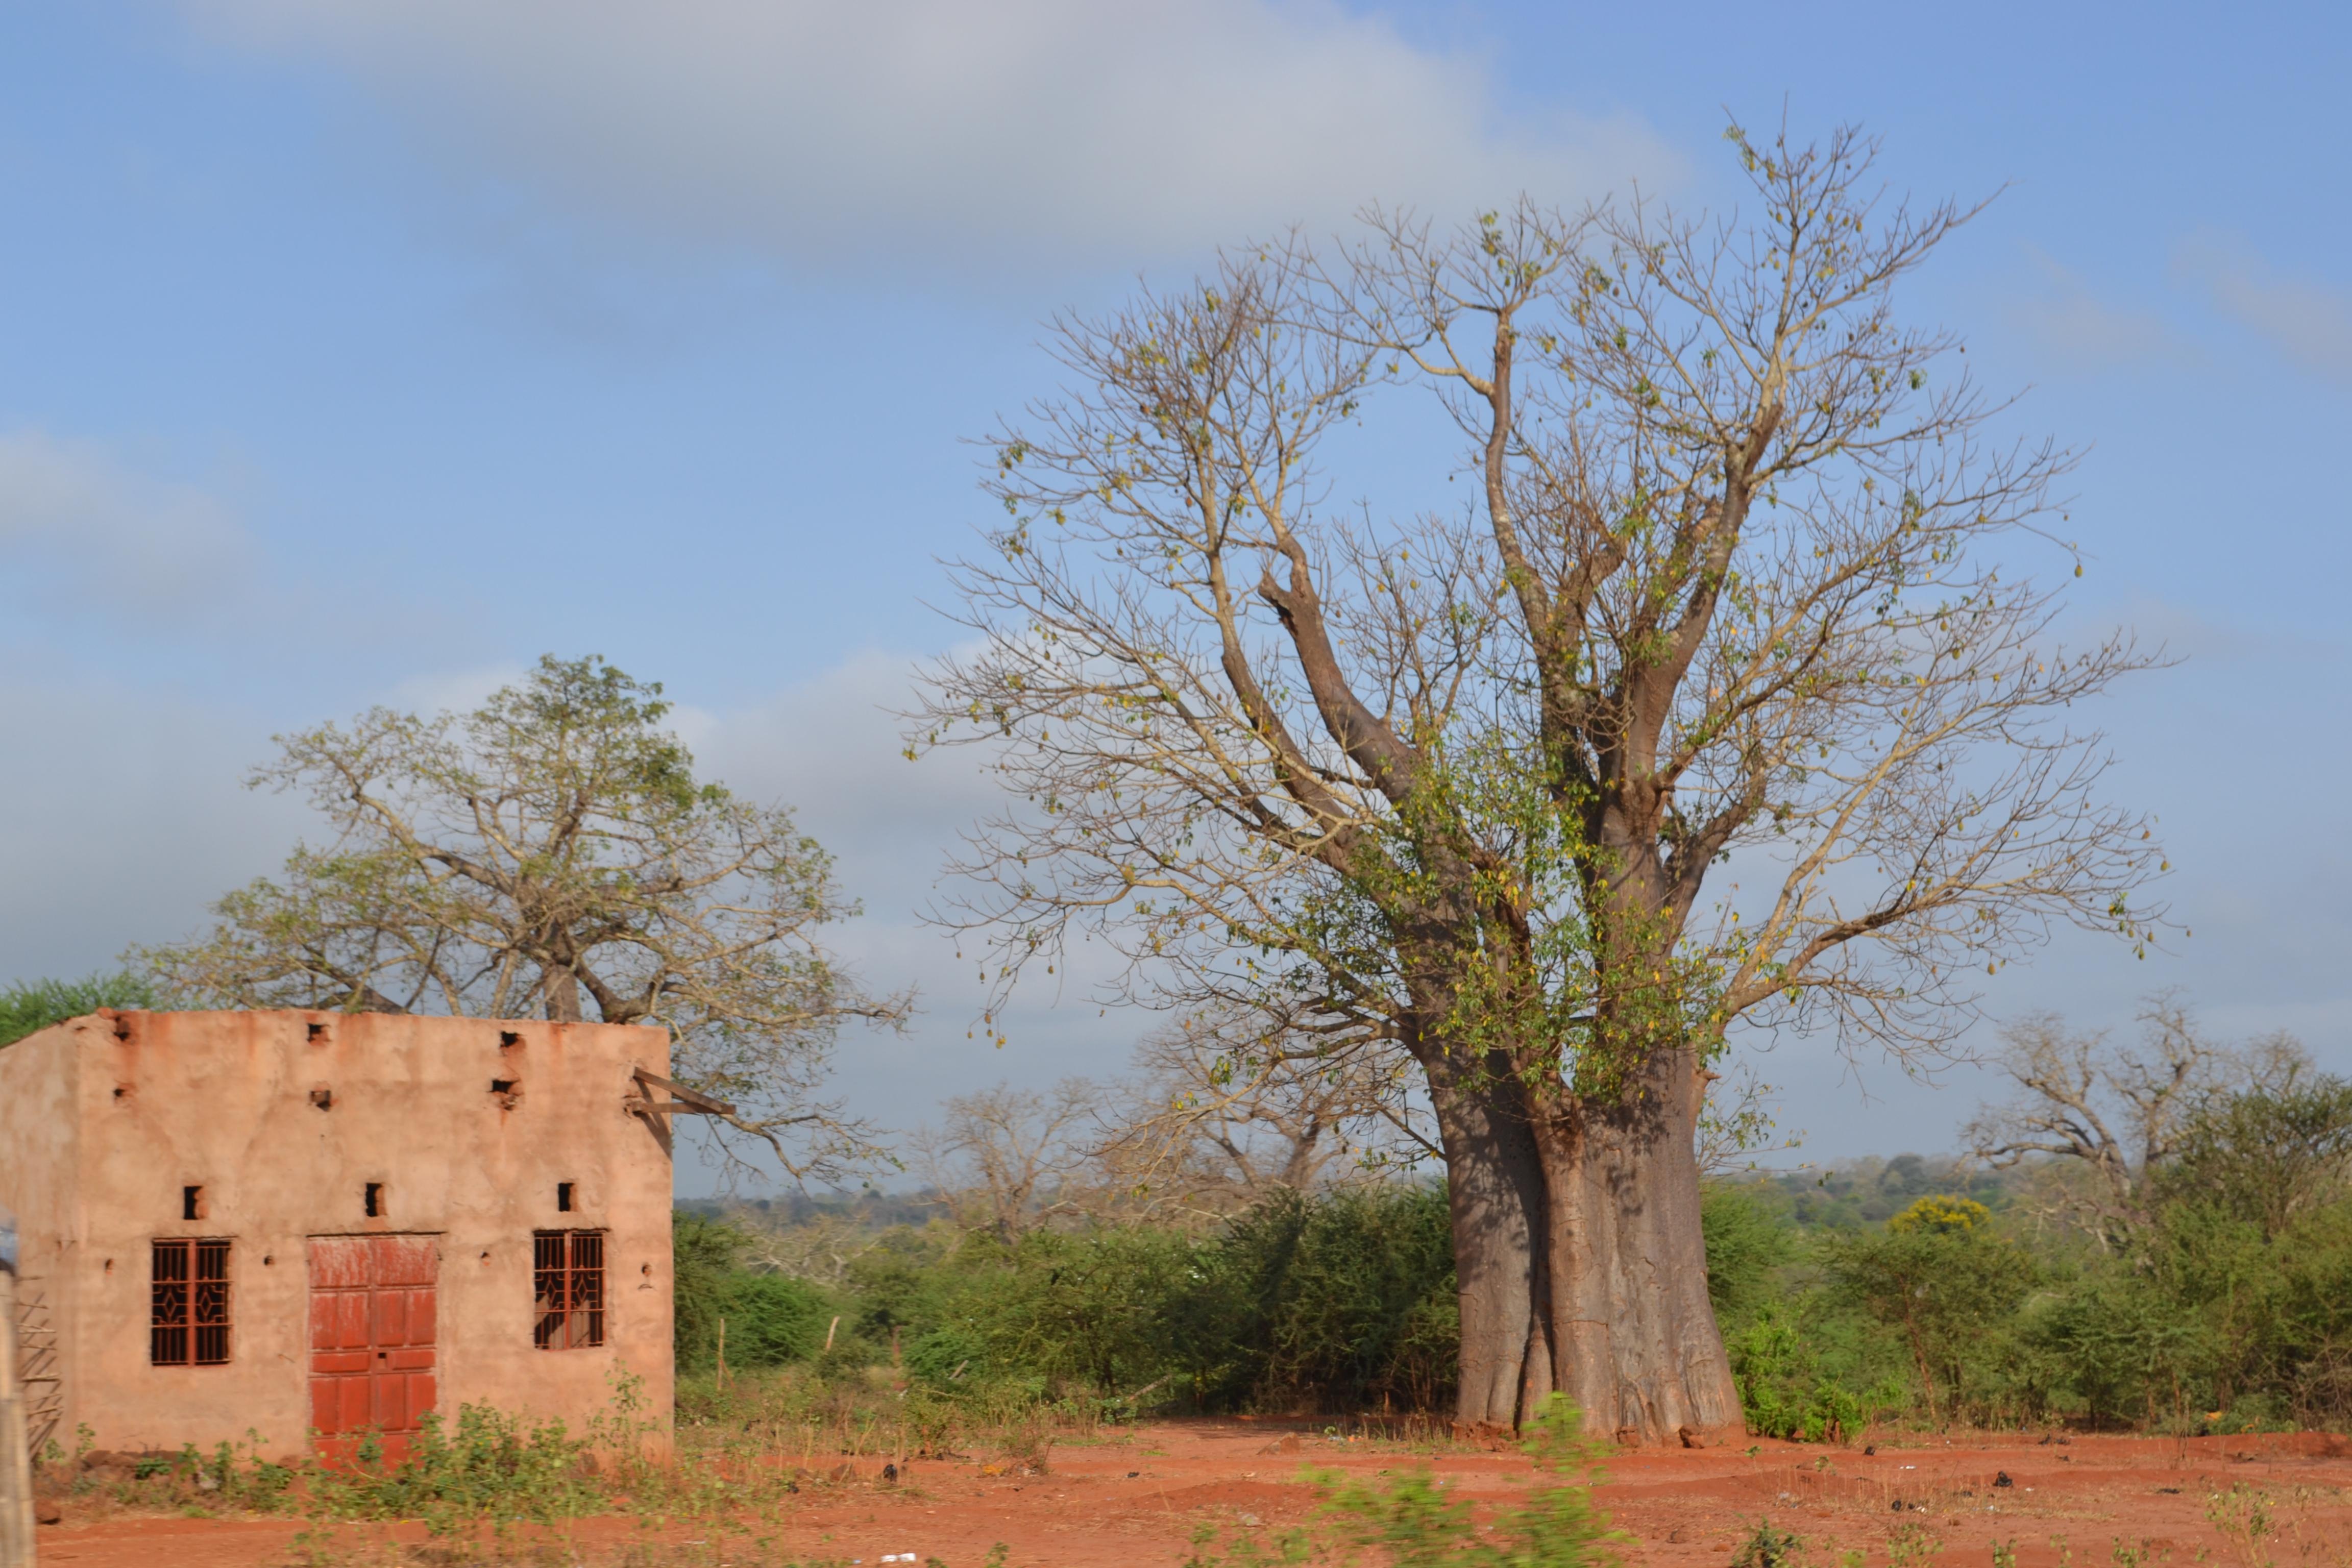 Baobab Tree in Kibwezi Kenya